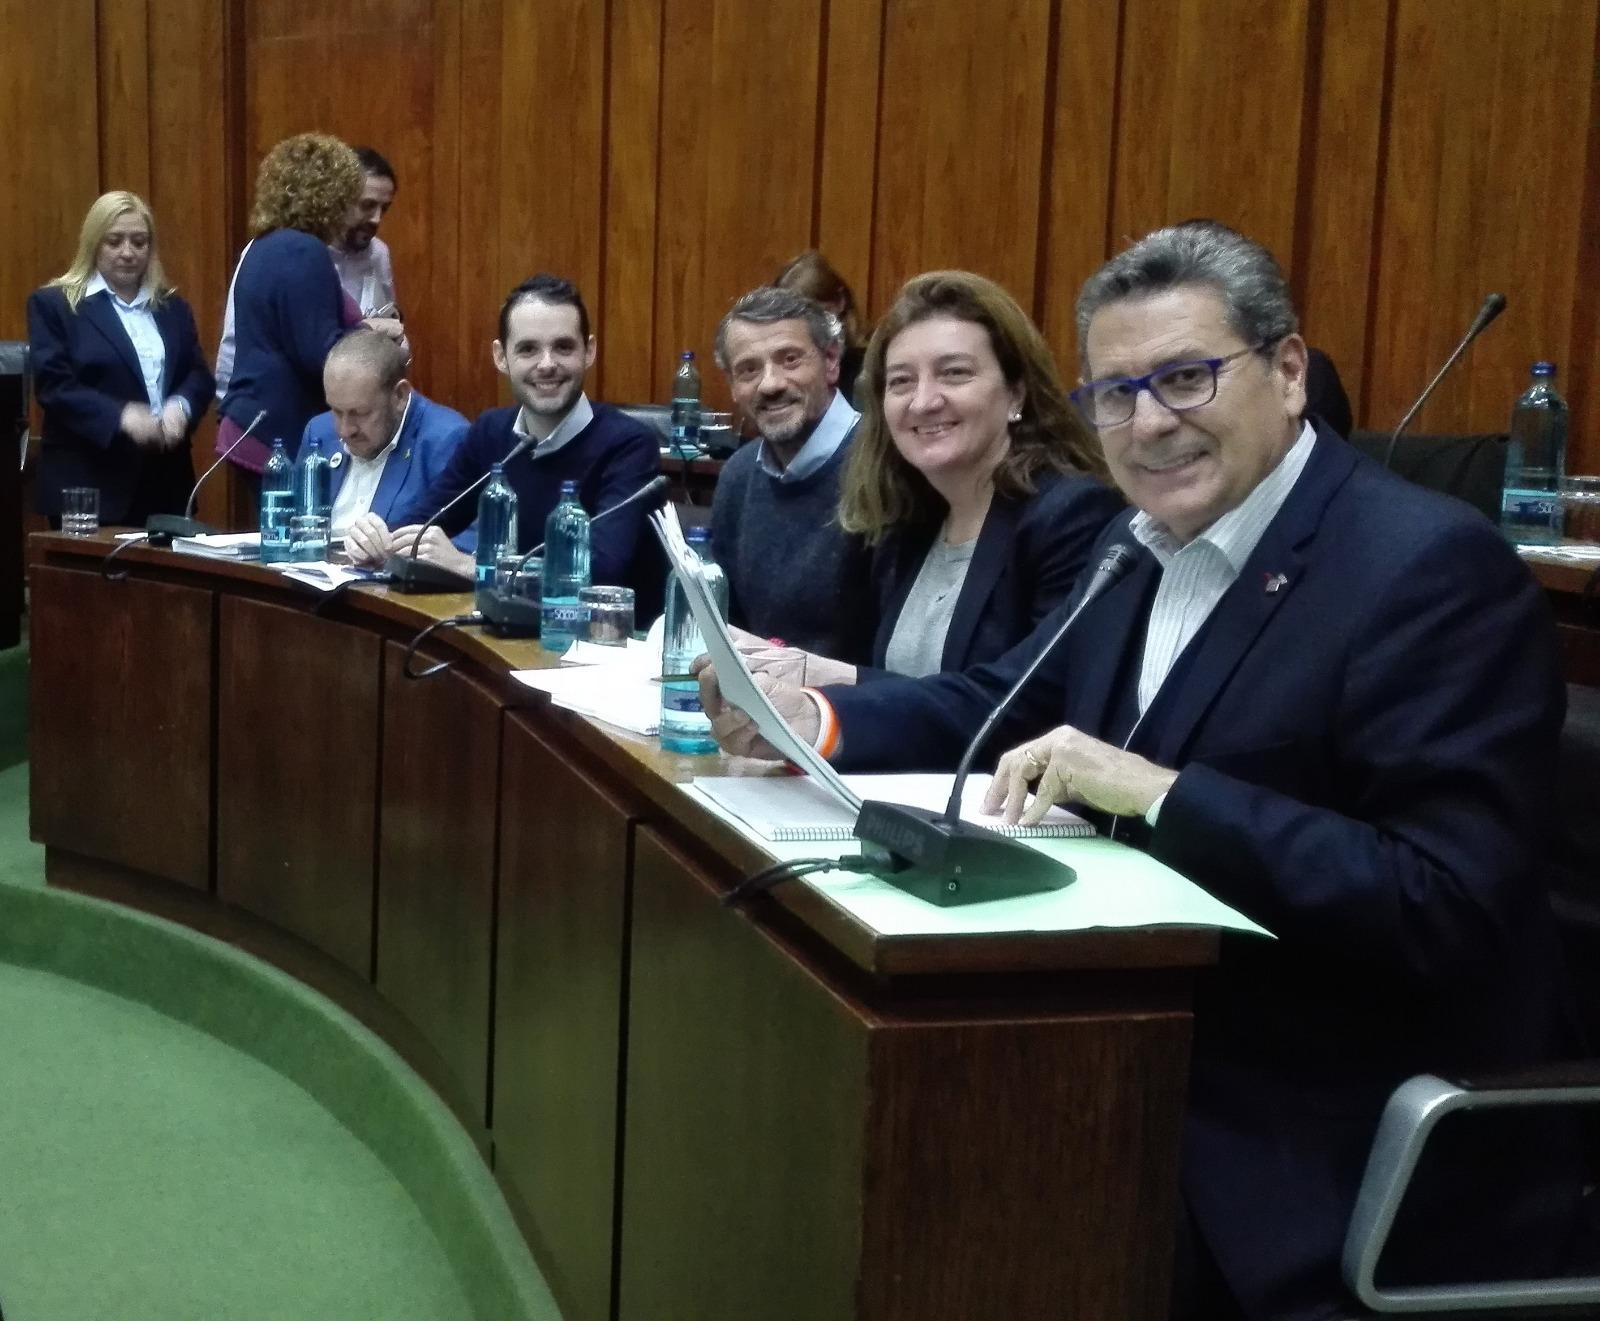 Los cuatro concejales de Cs l'Hospitalet momentos antes de iniciar el pleno municipal de noviembre